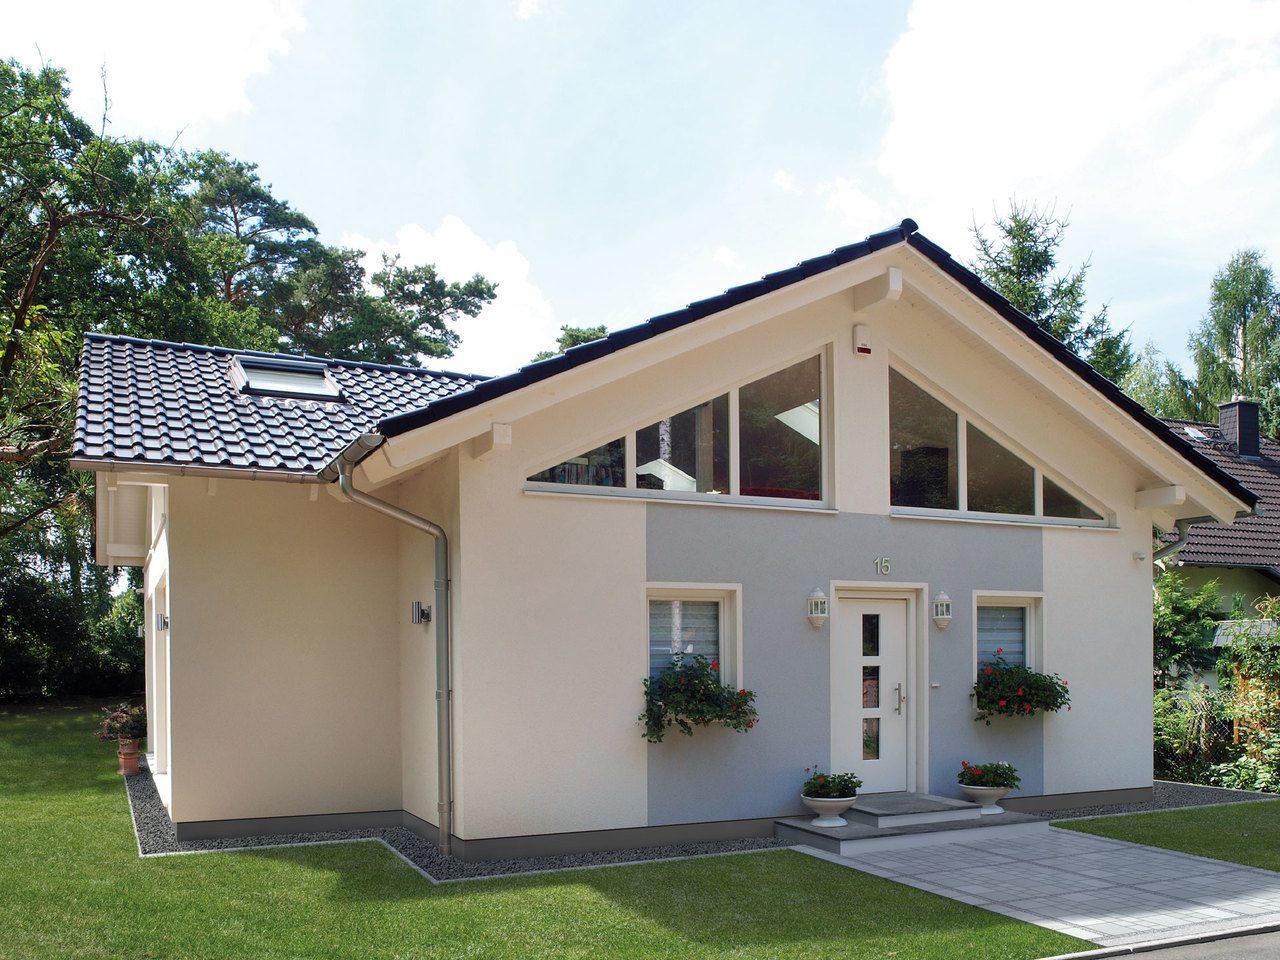 Schwabenhaus Einfamilienhaus Da Capo Sonderplanung - Hauseingang